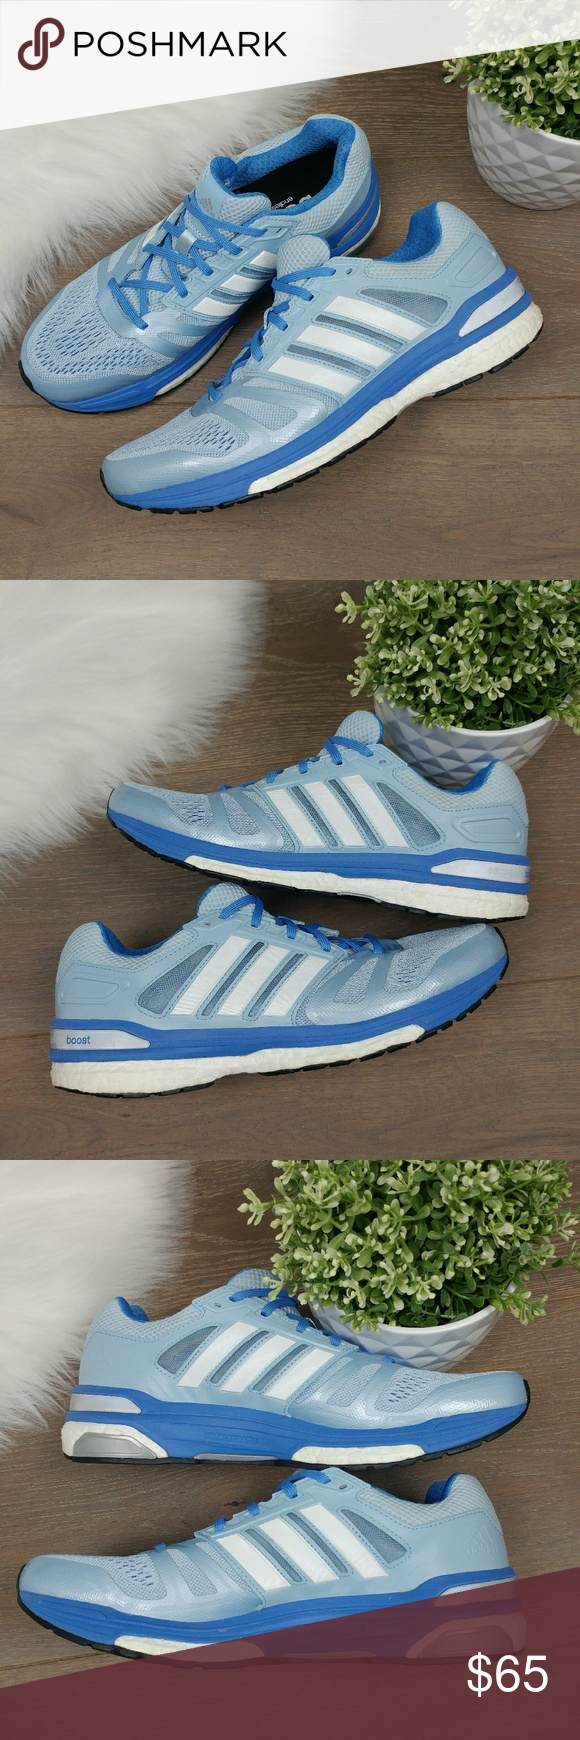 separation shoes 487dc 10987 Adidas Supernova Sequence Boost 7 Lucky Blue Adidas Running Supernova  Sequence Boost 7 Lucky blue,